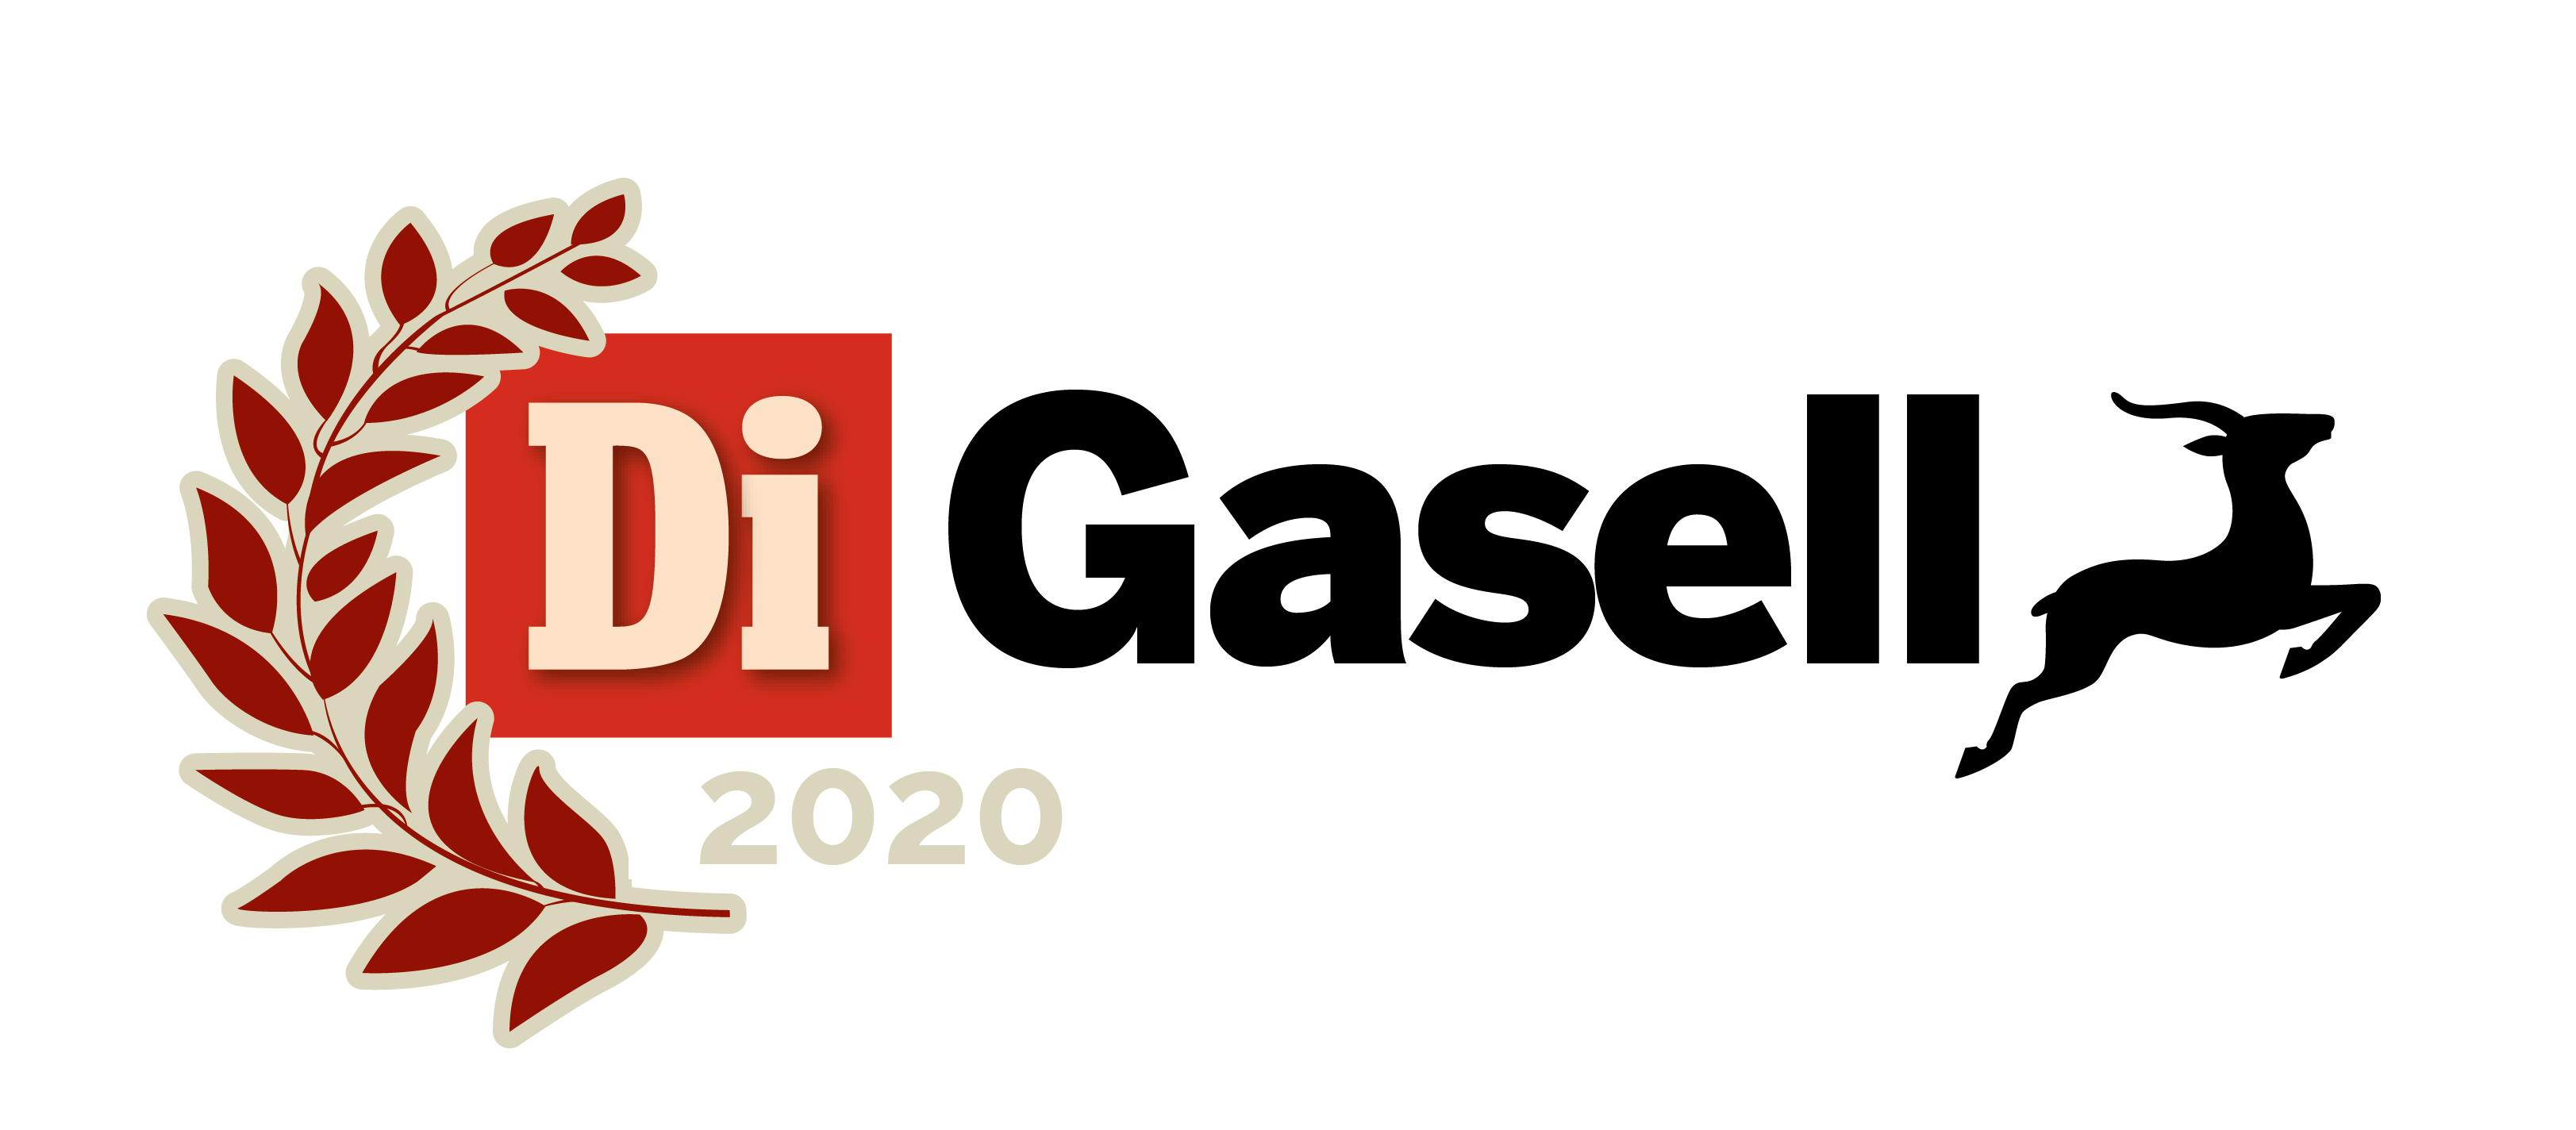 Swescan blir Di Gasellföretag 2020